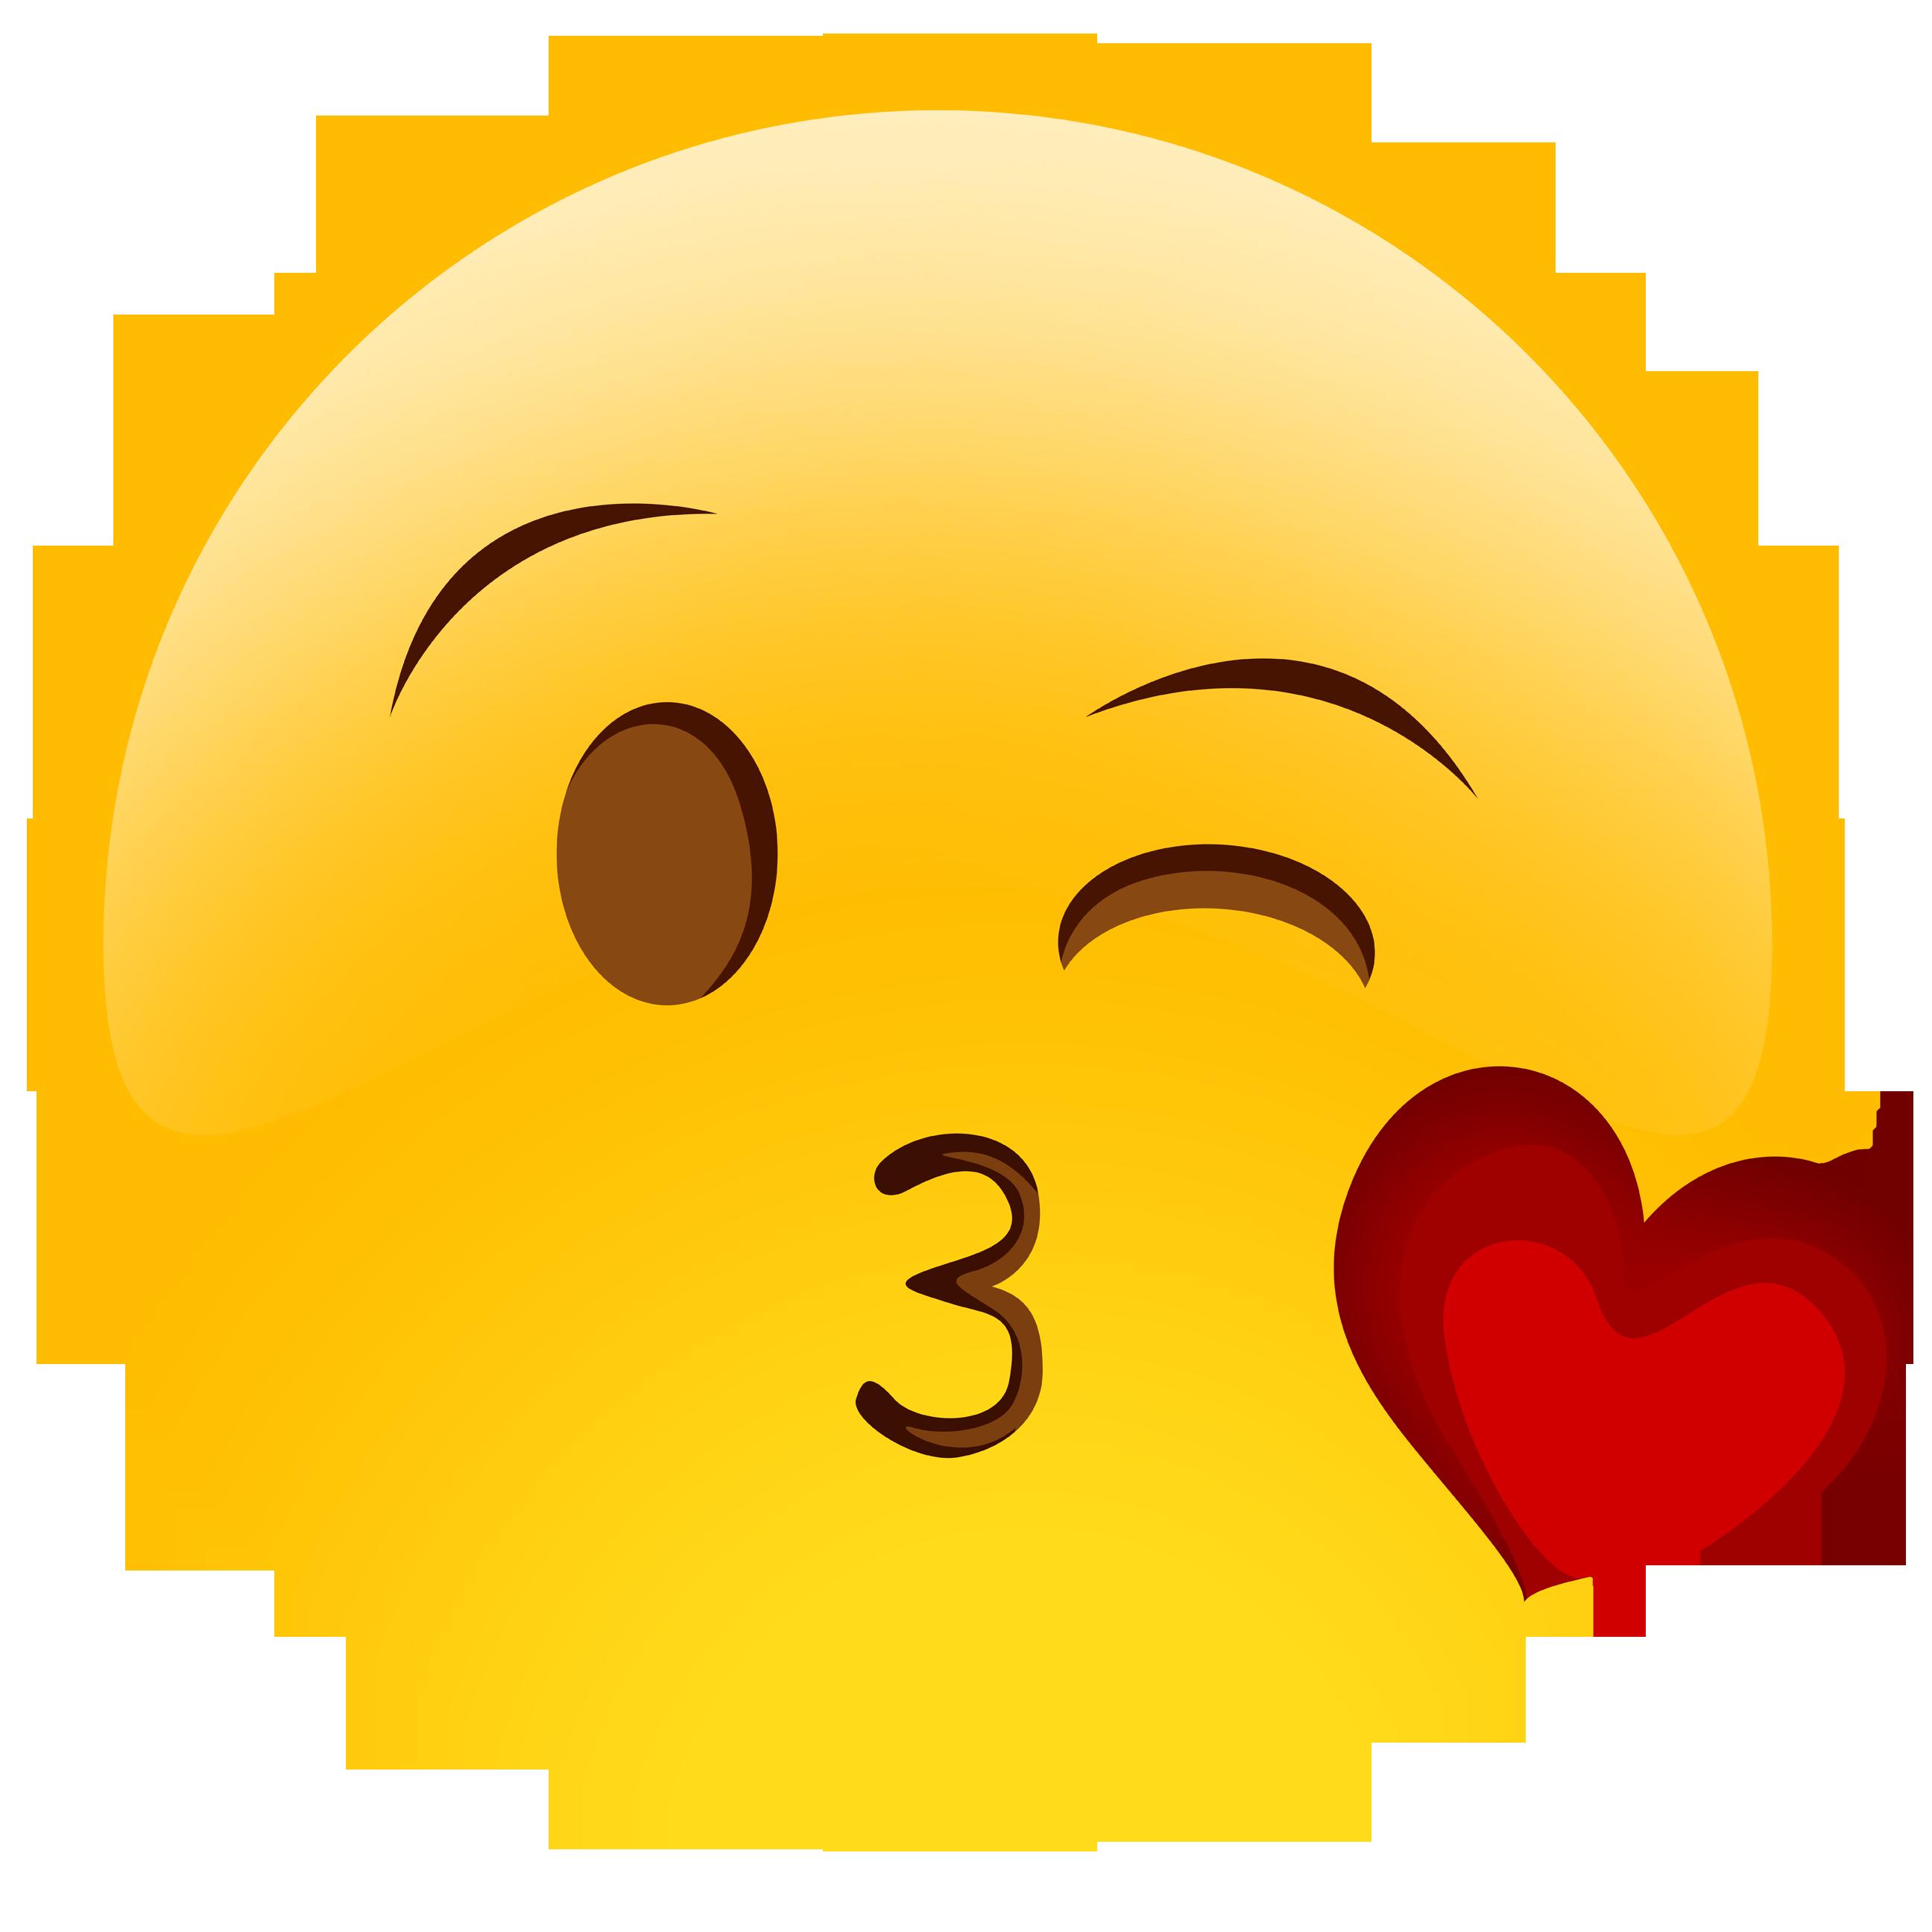 Emoji important clipart free what emoji are you | emoji | Laughing emoji, Kiss emoji, Emoji pictures free